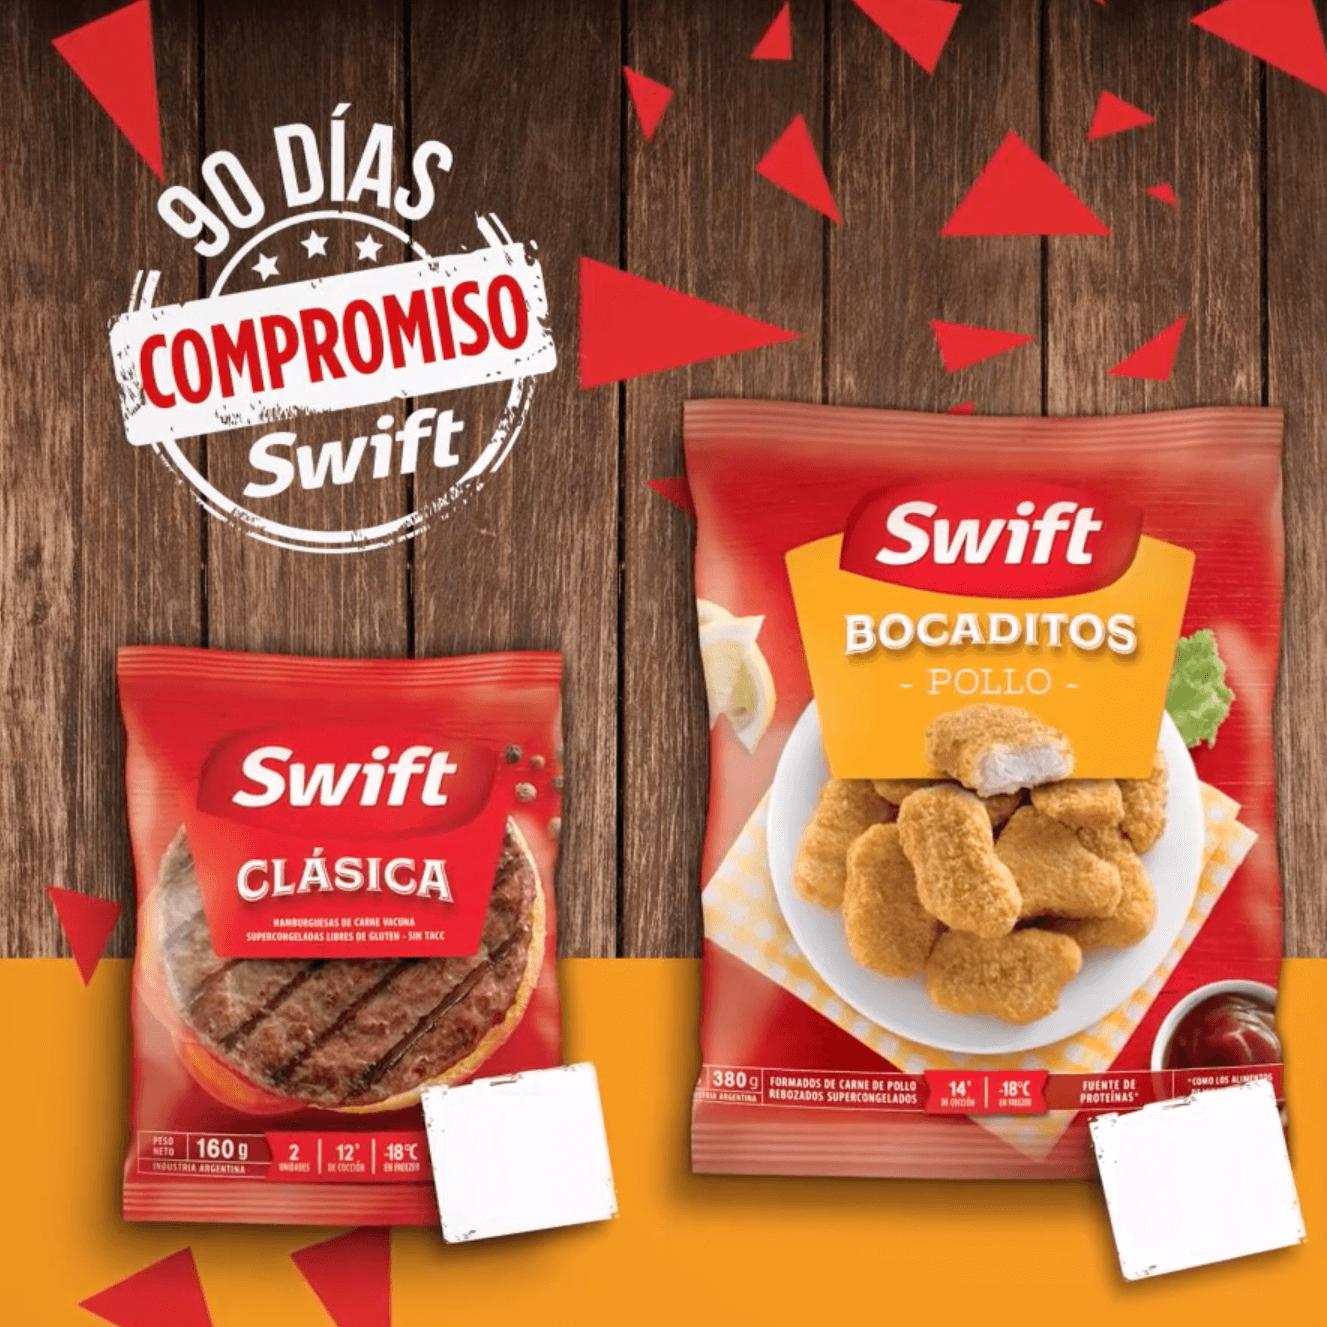 SWIFT - COMPROMISO SWIFT